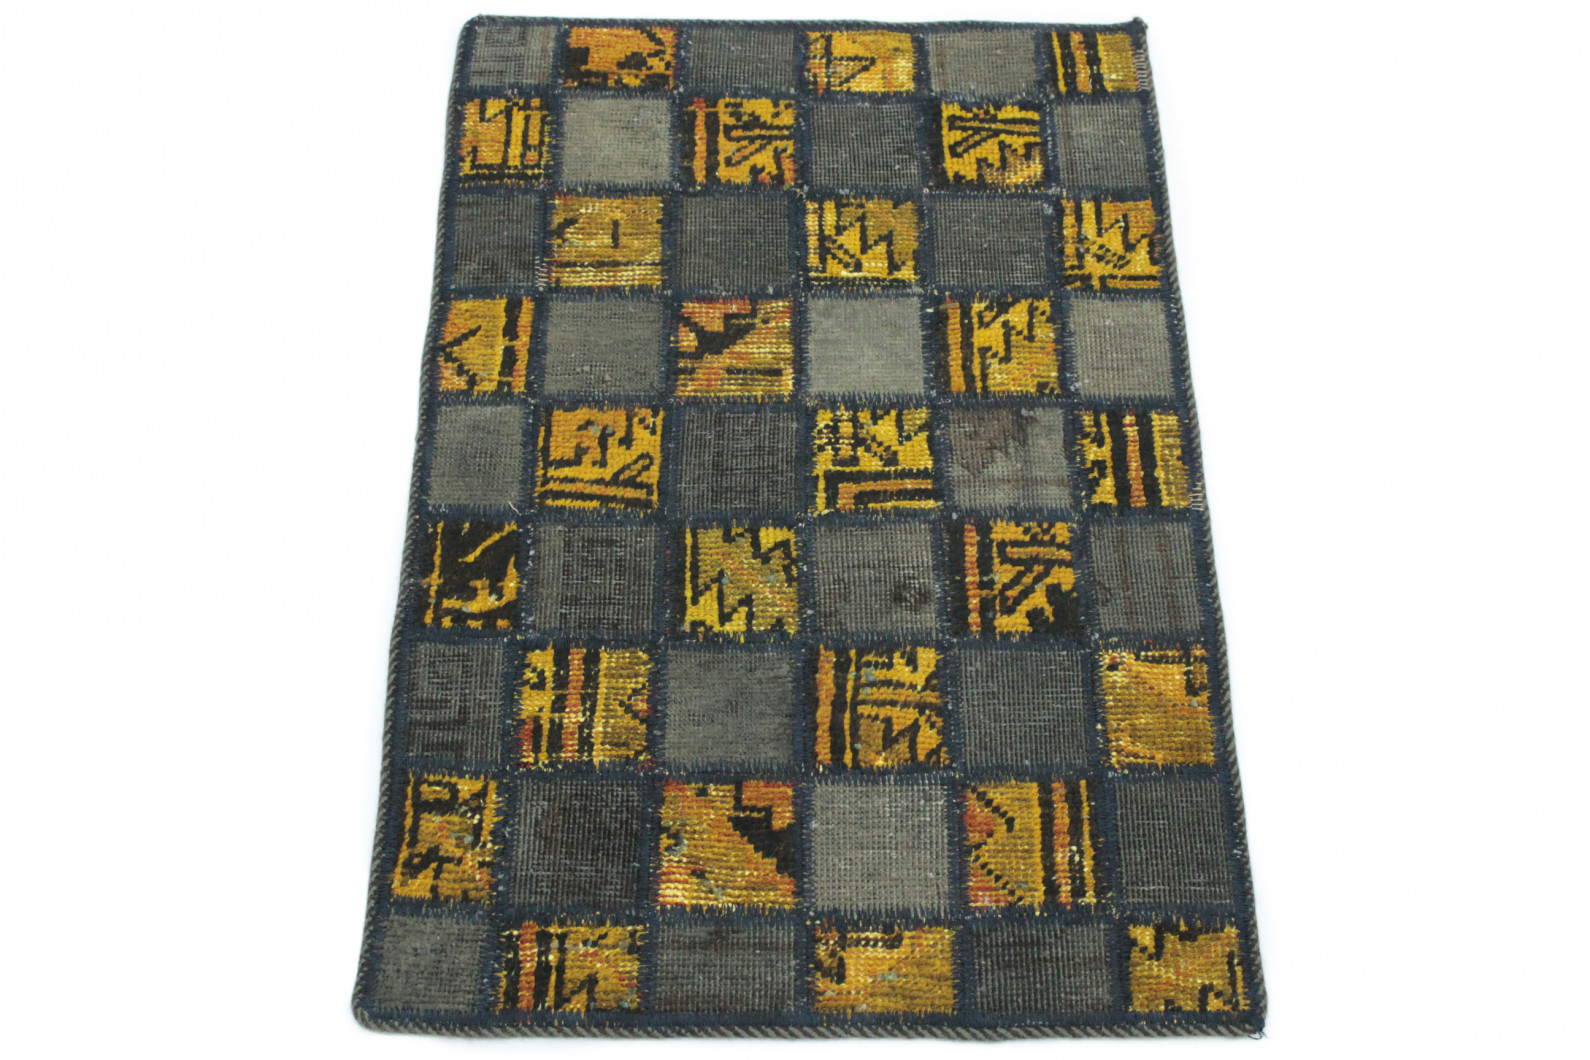 teppich gelb grau teppich gelb grau haus ideen teppich gelb grau grau gelb in teppich kaufen. Black Bedroom Furniture Sets. Home Design Ideas